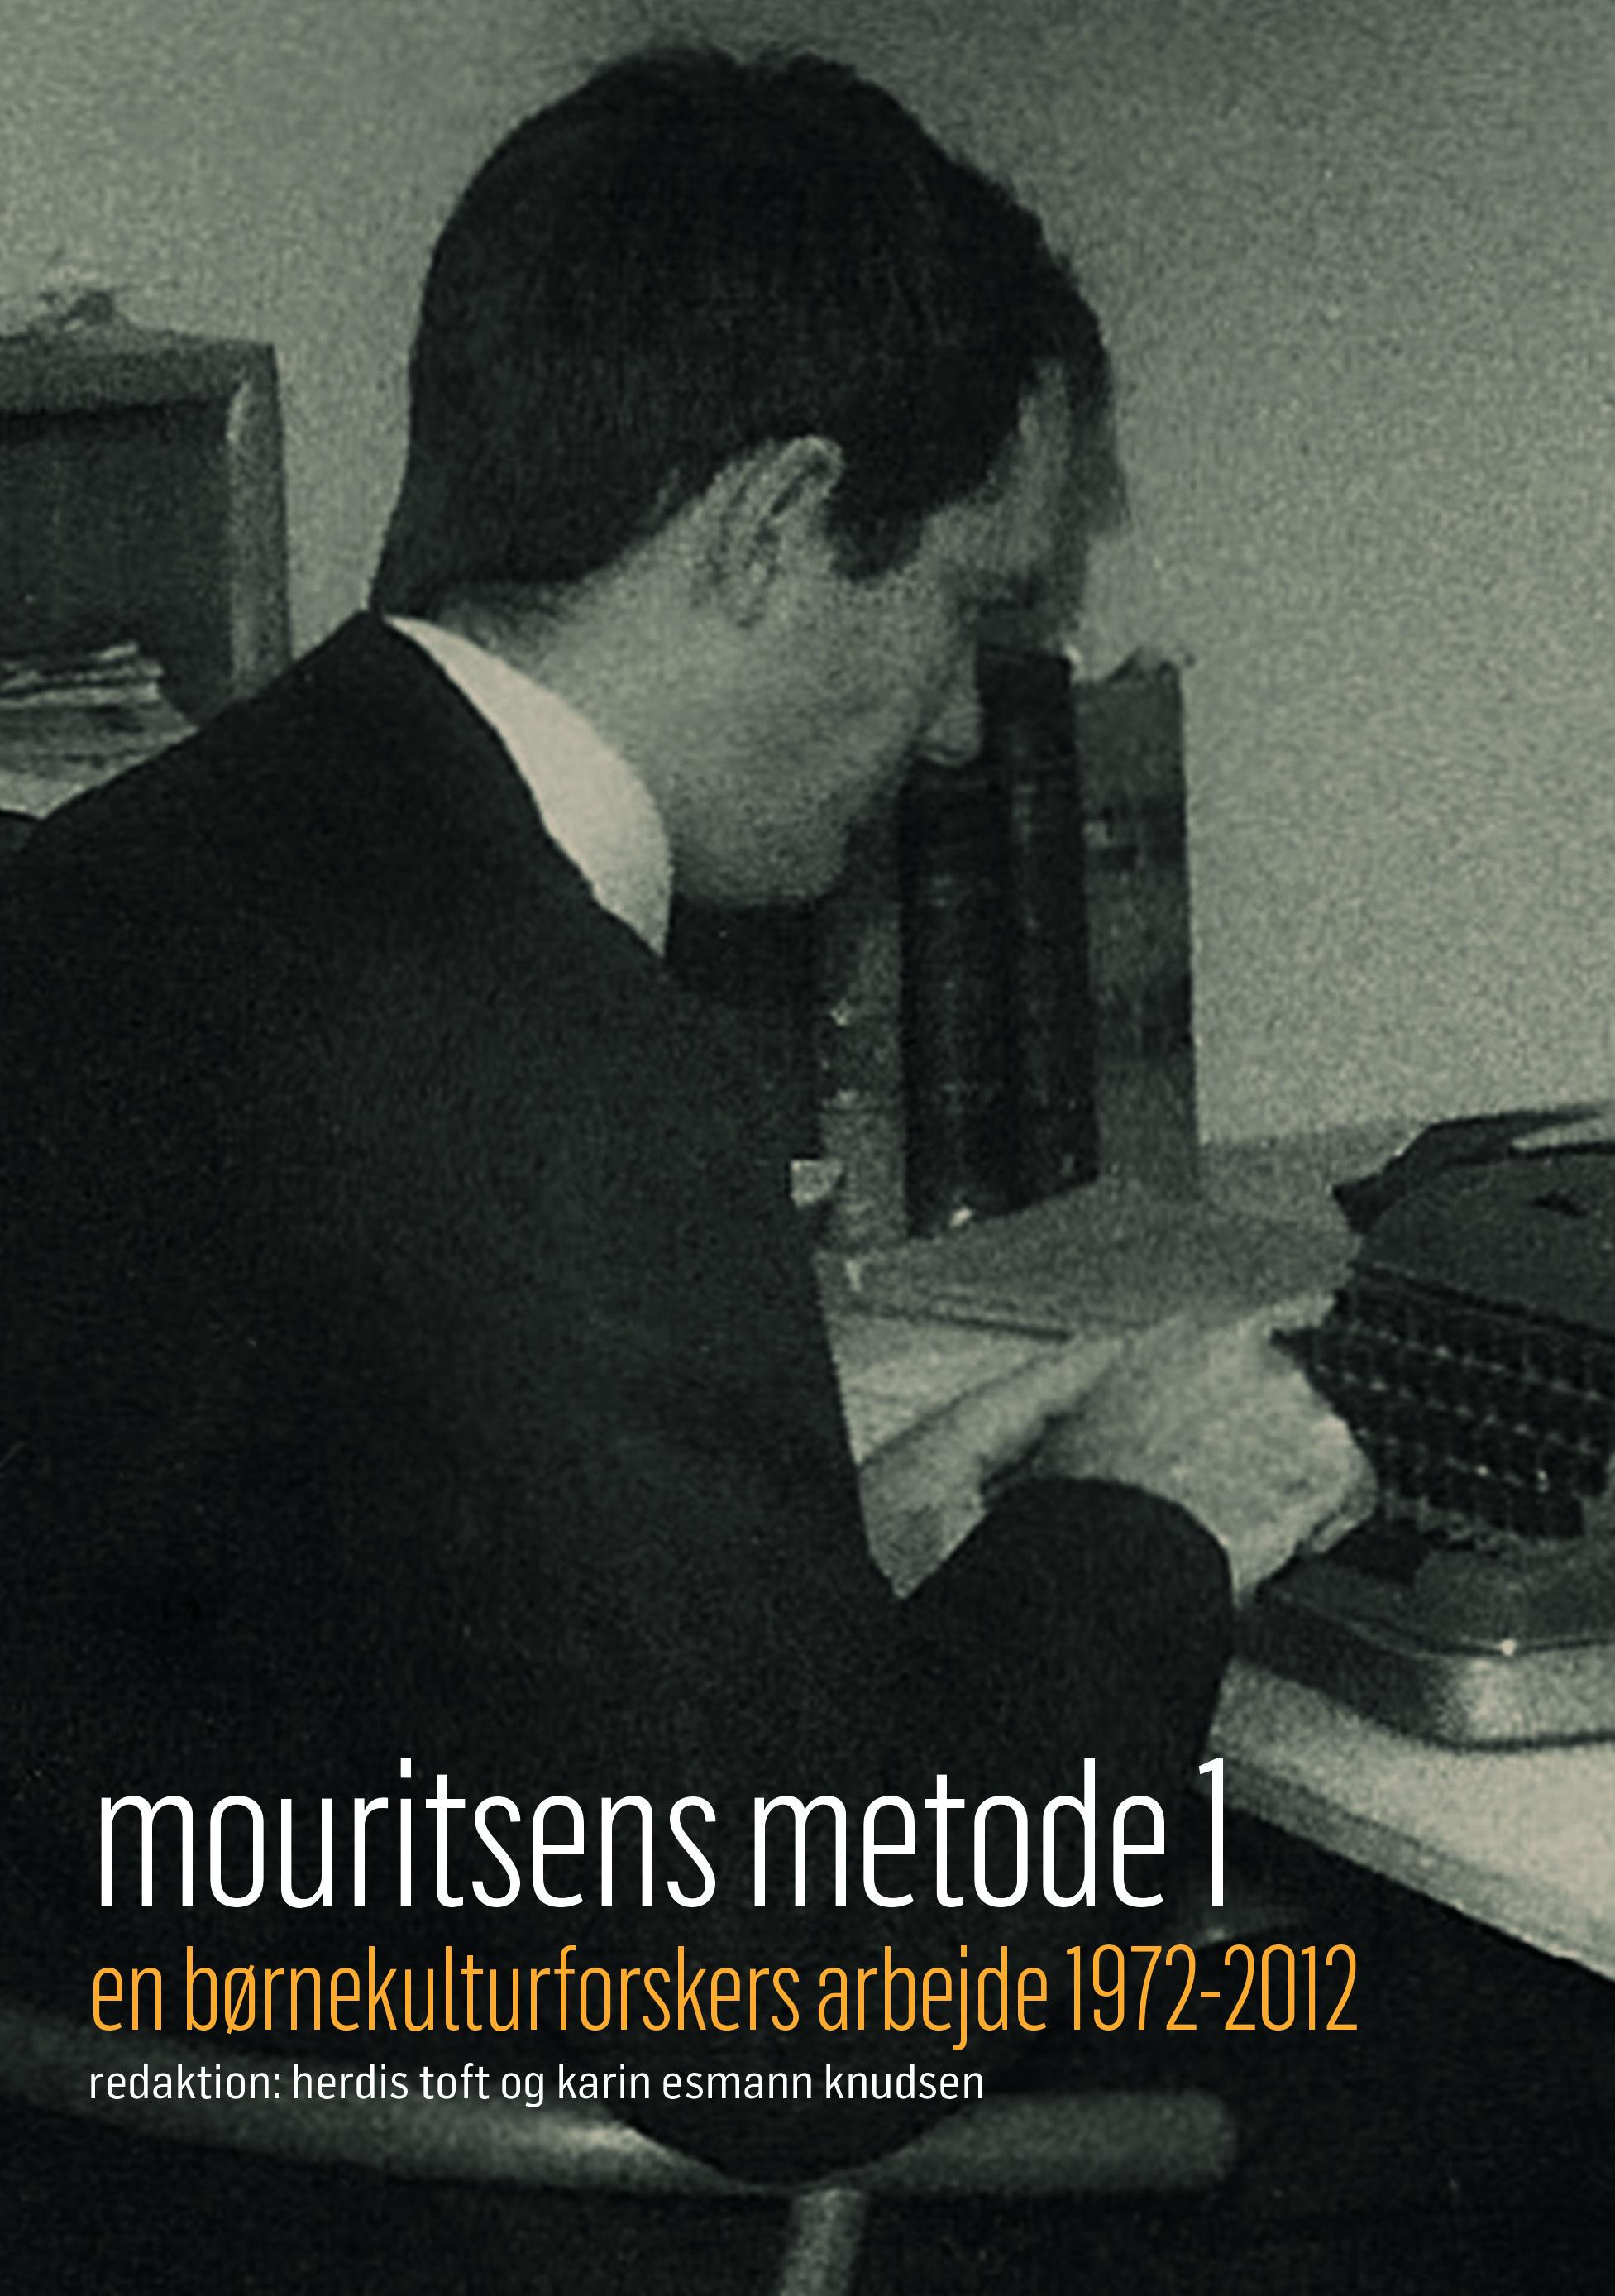 Mouritsens Metode 1 – en børnekulturforskers arbejde 1972-2012